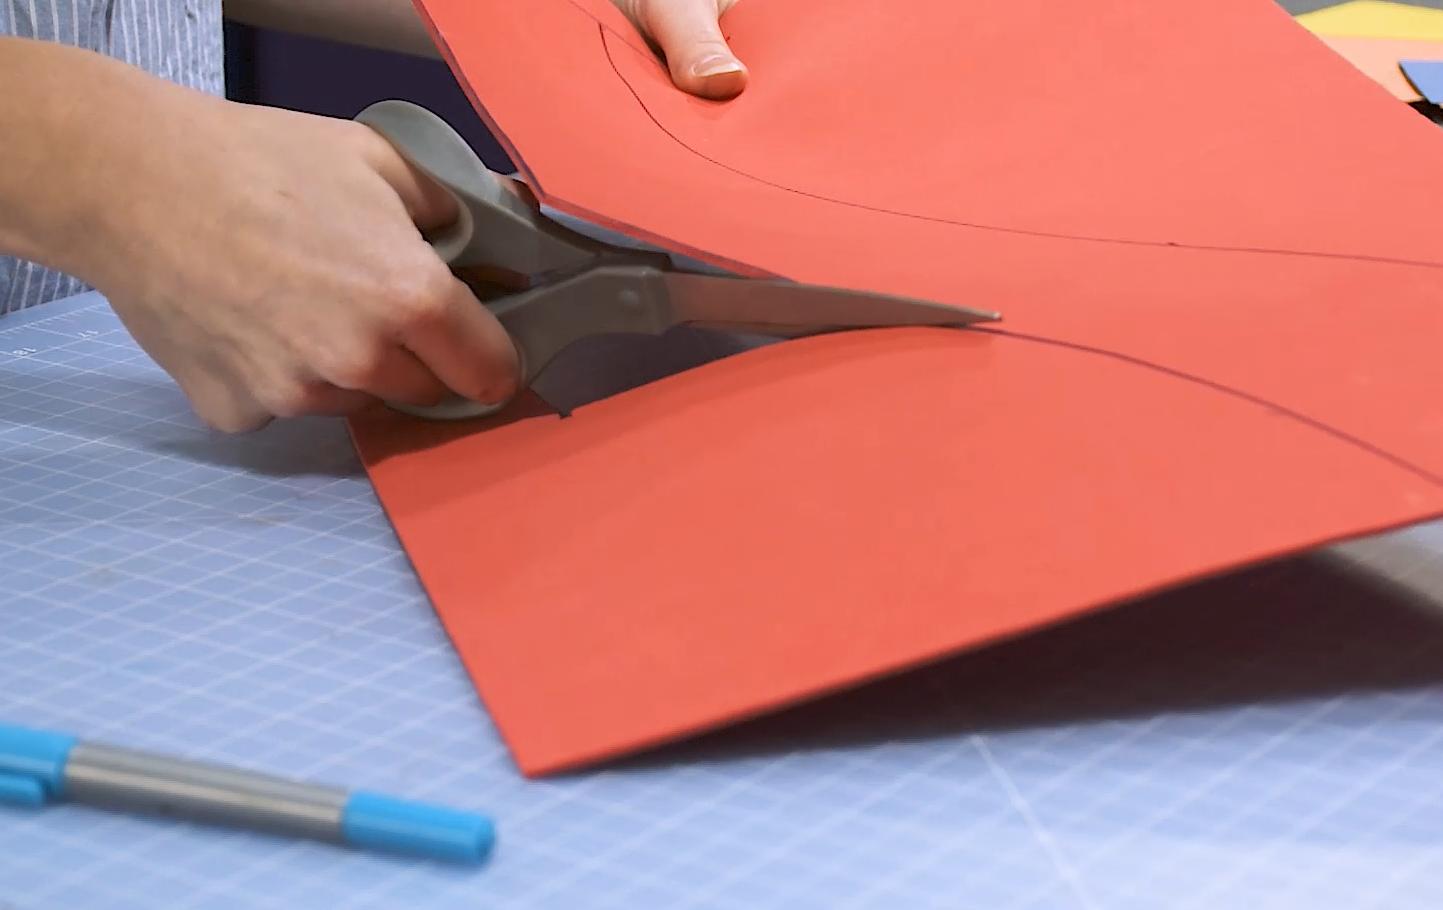 Cosplayer cutting a piece of craft EVA foam with scissors